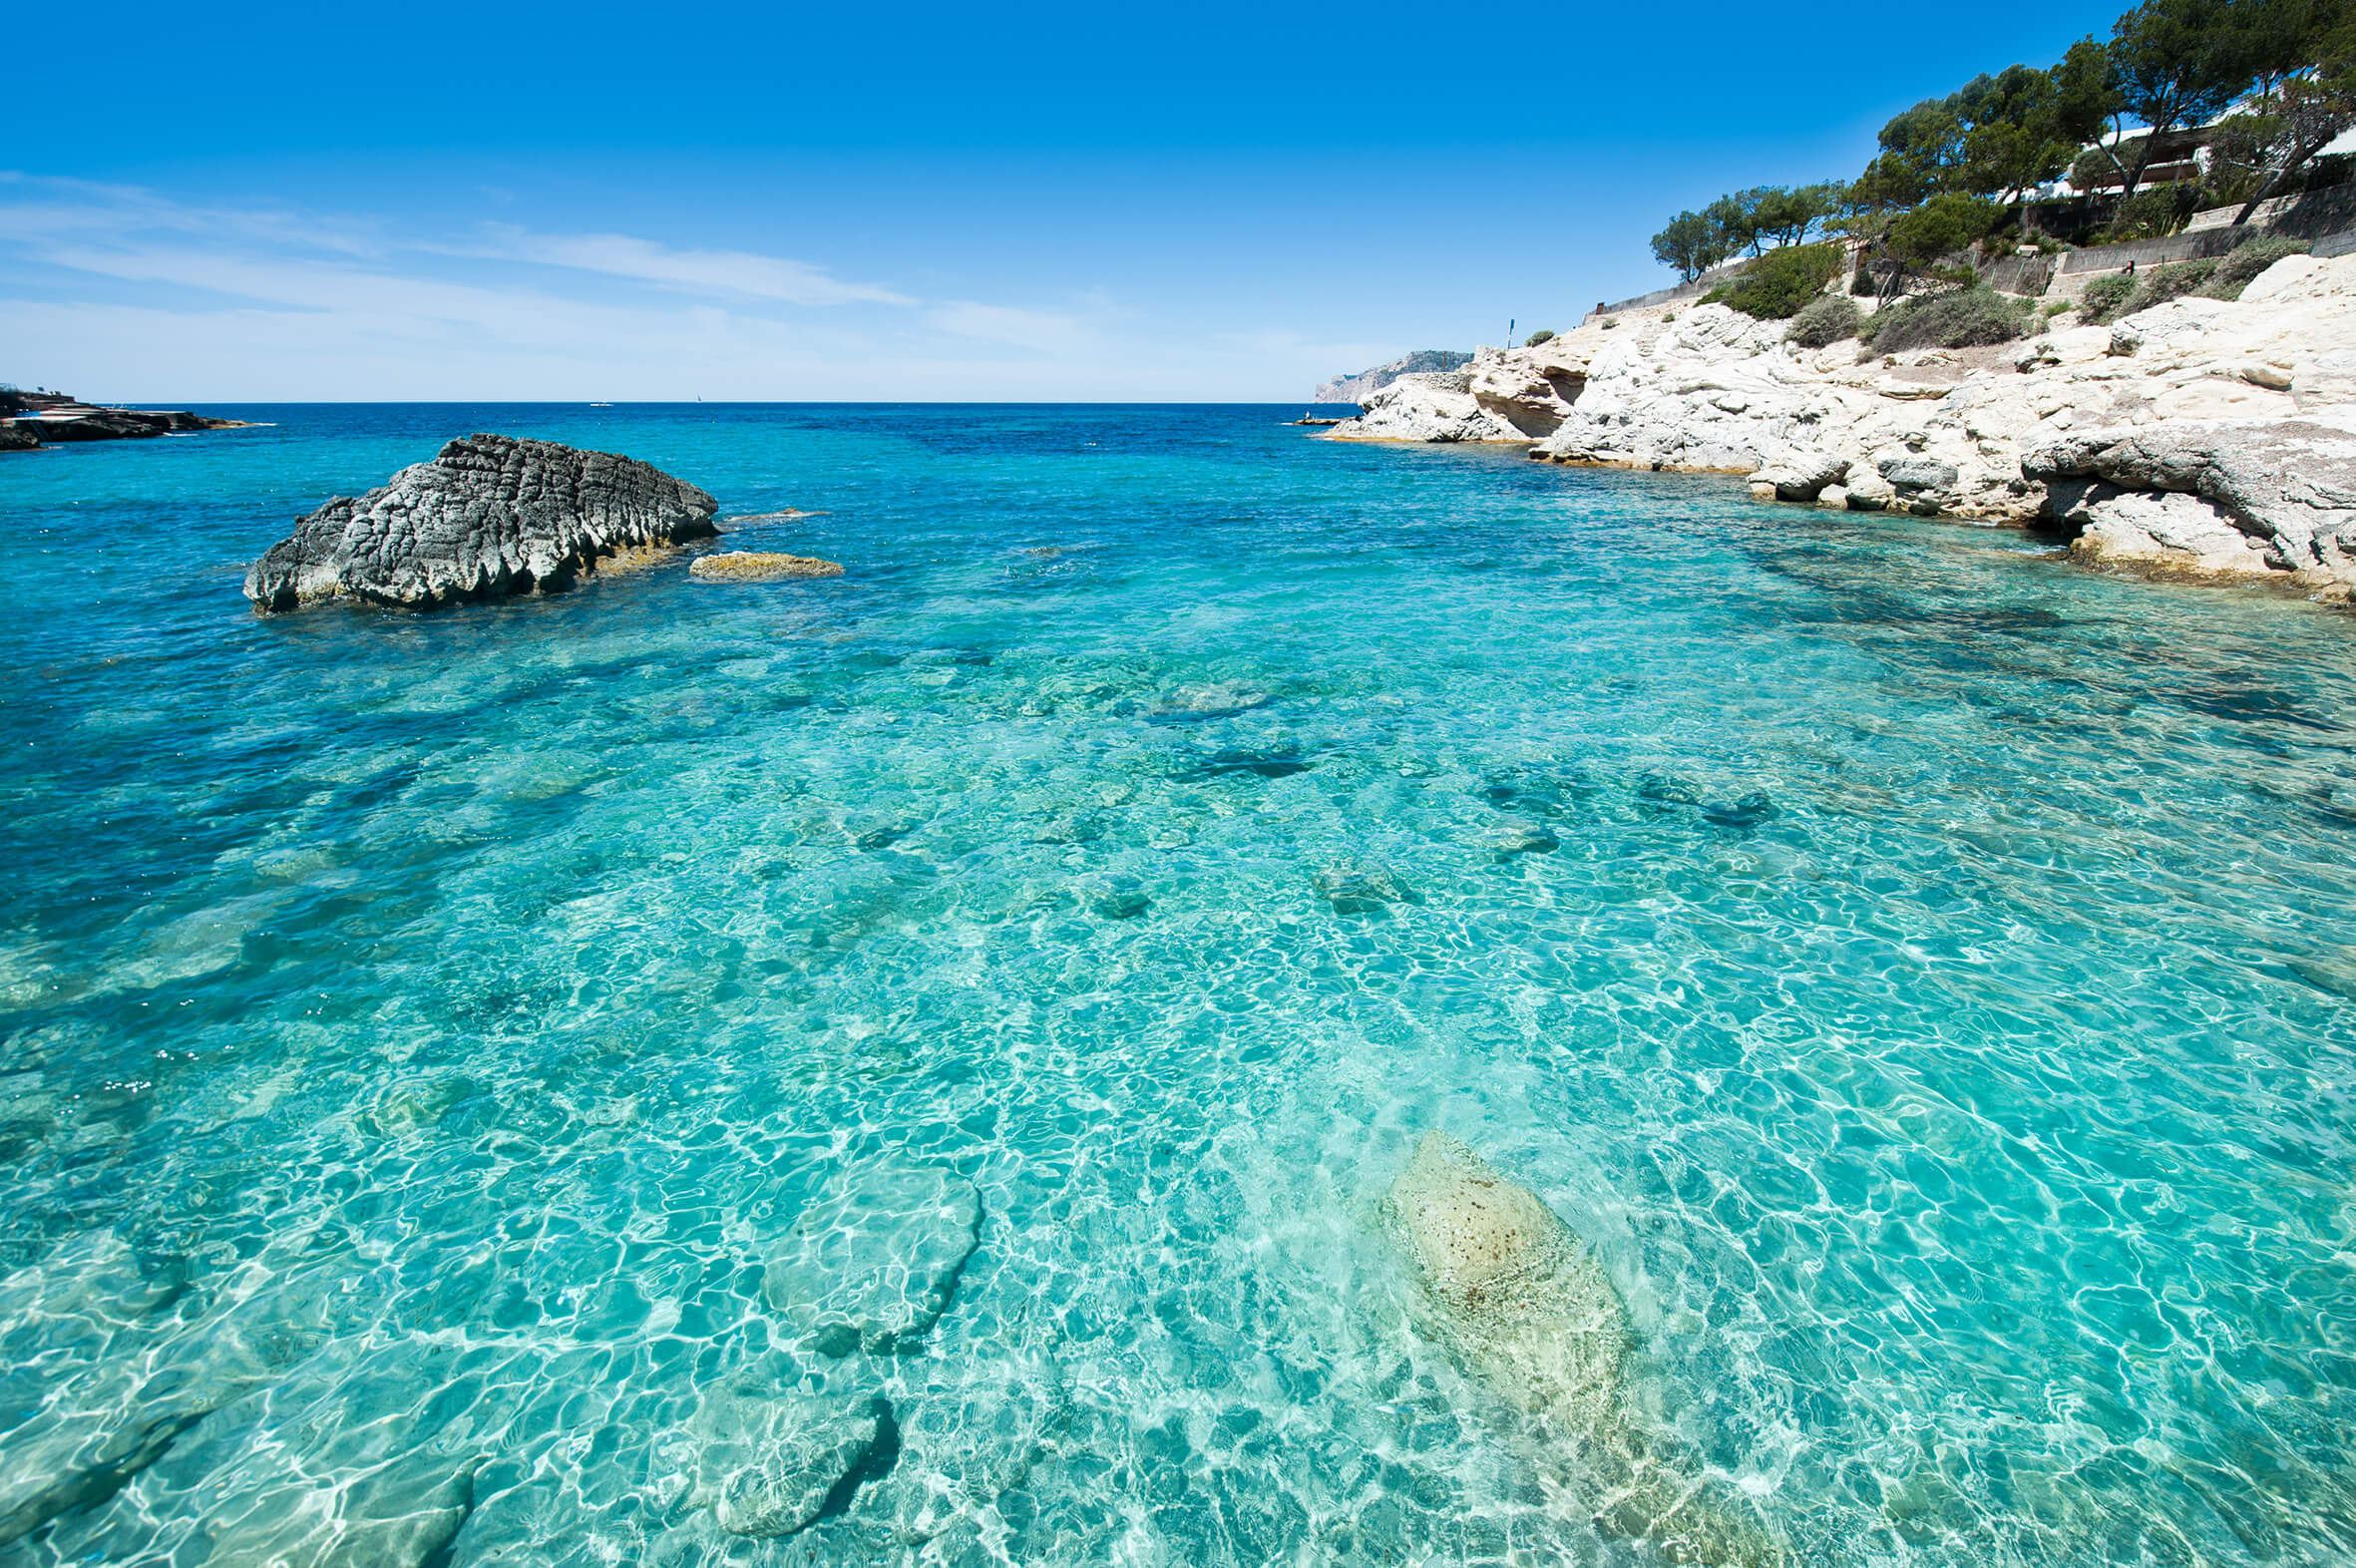 Playa Cala Blanca - Mallorca. Cala Blanca beach - Majorca